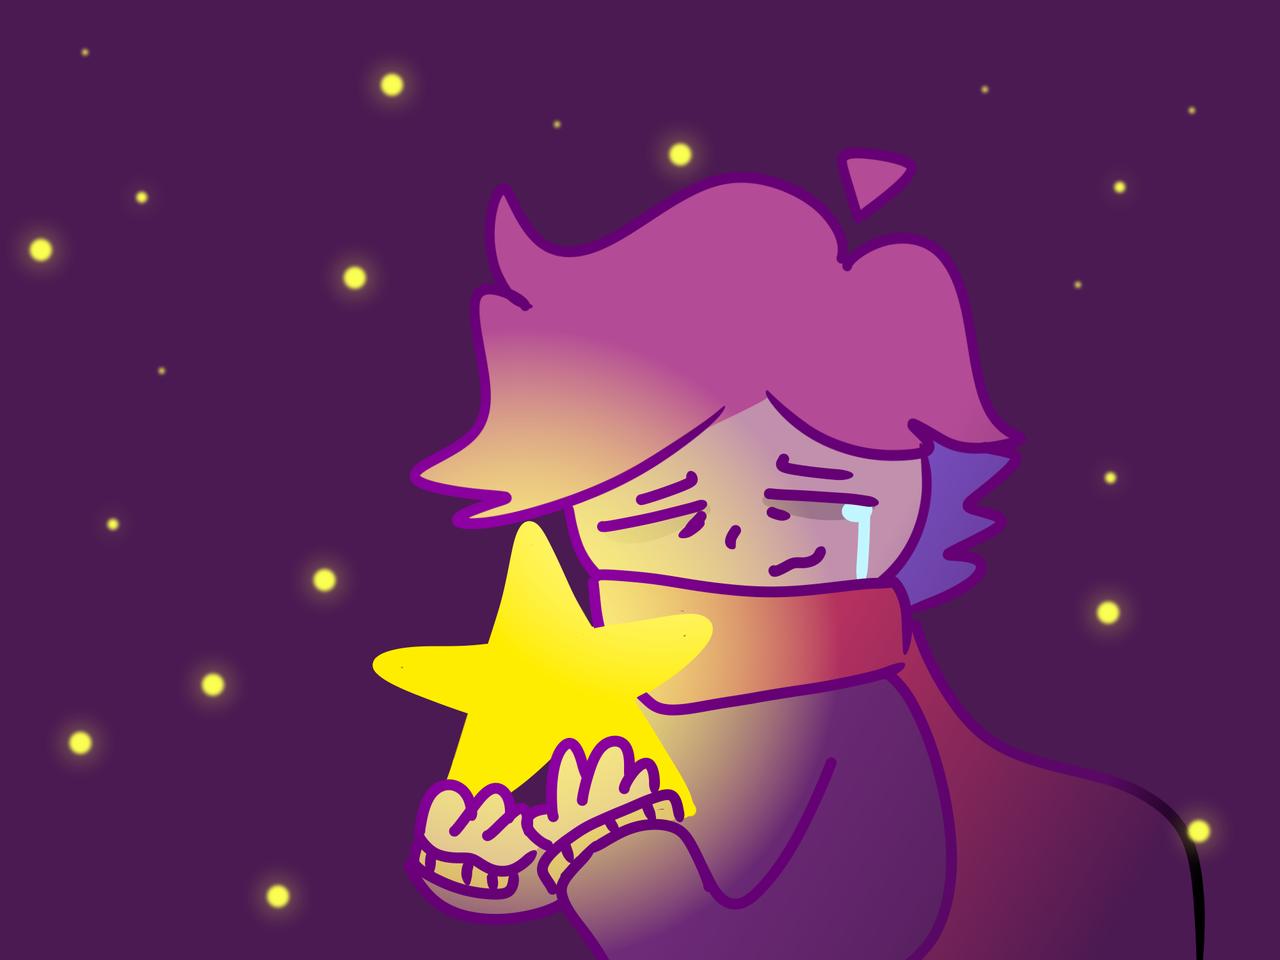 (leer desc) avisó de algunas cosas osiosi 😳 Illust of ✰ Locke ✰ medibangpaint star a uwu Locke